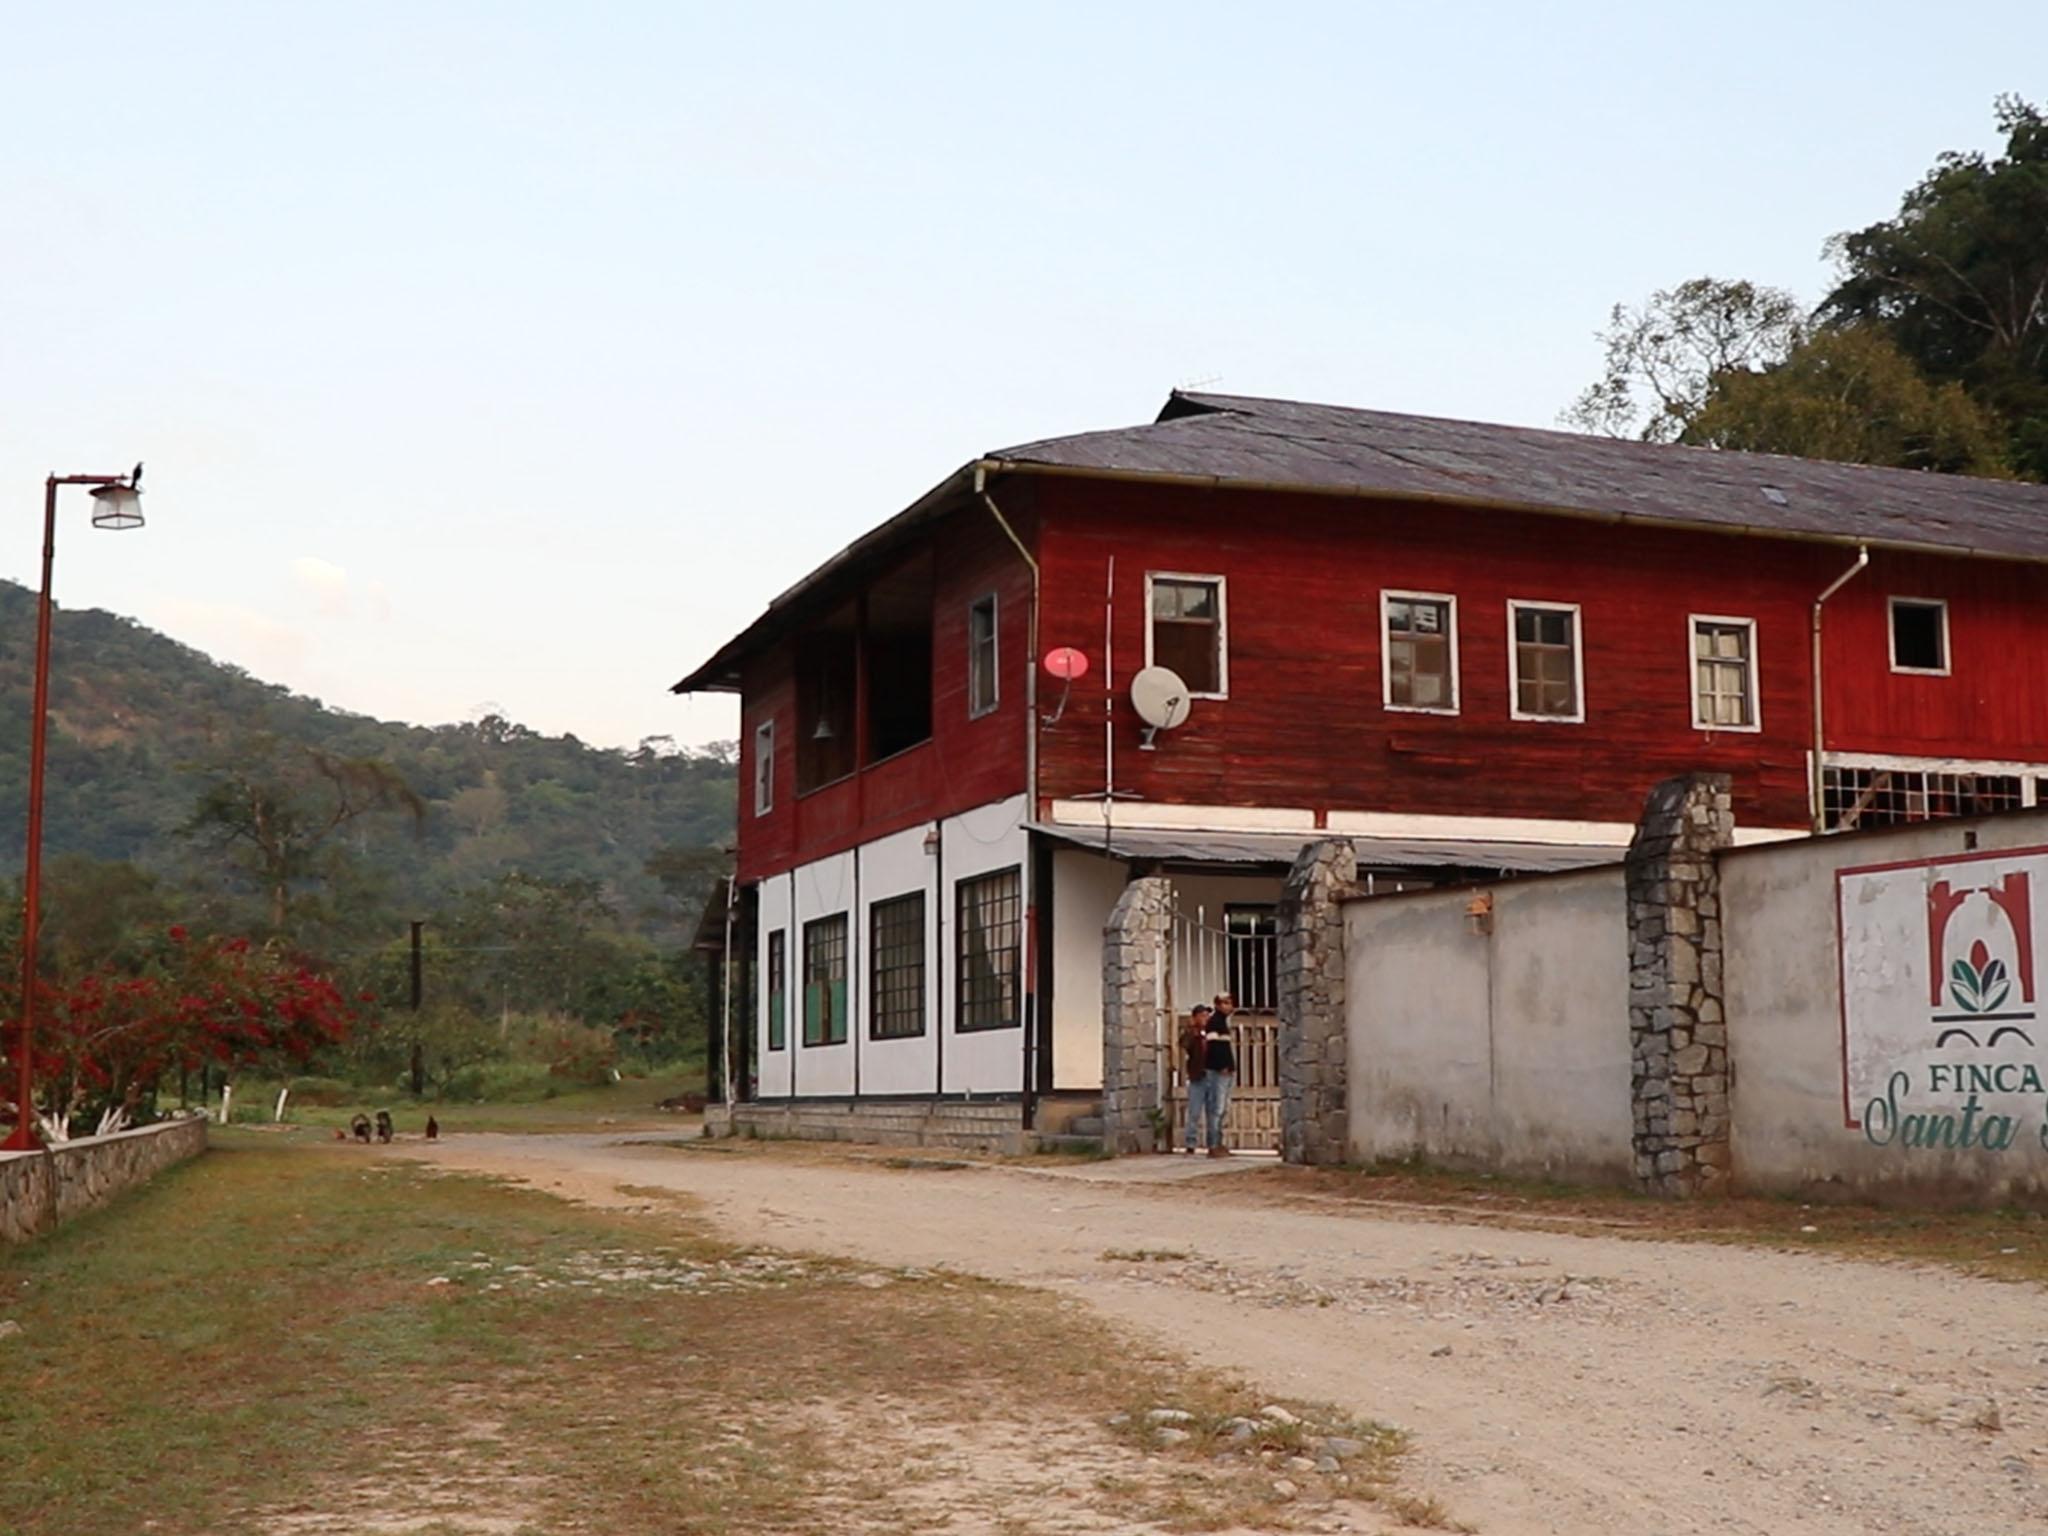 Anbassa Artisan Torrefacteur Cafe Grands Terroirs Santa Fe Mexique Bio Img 4